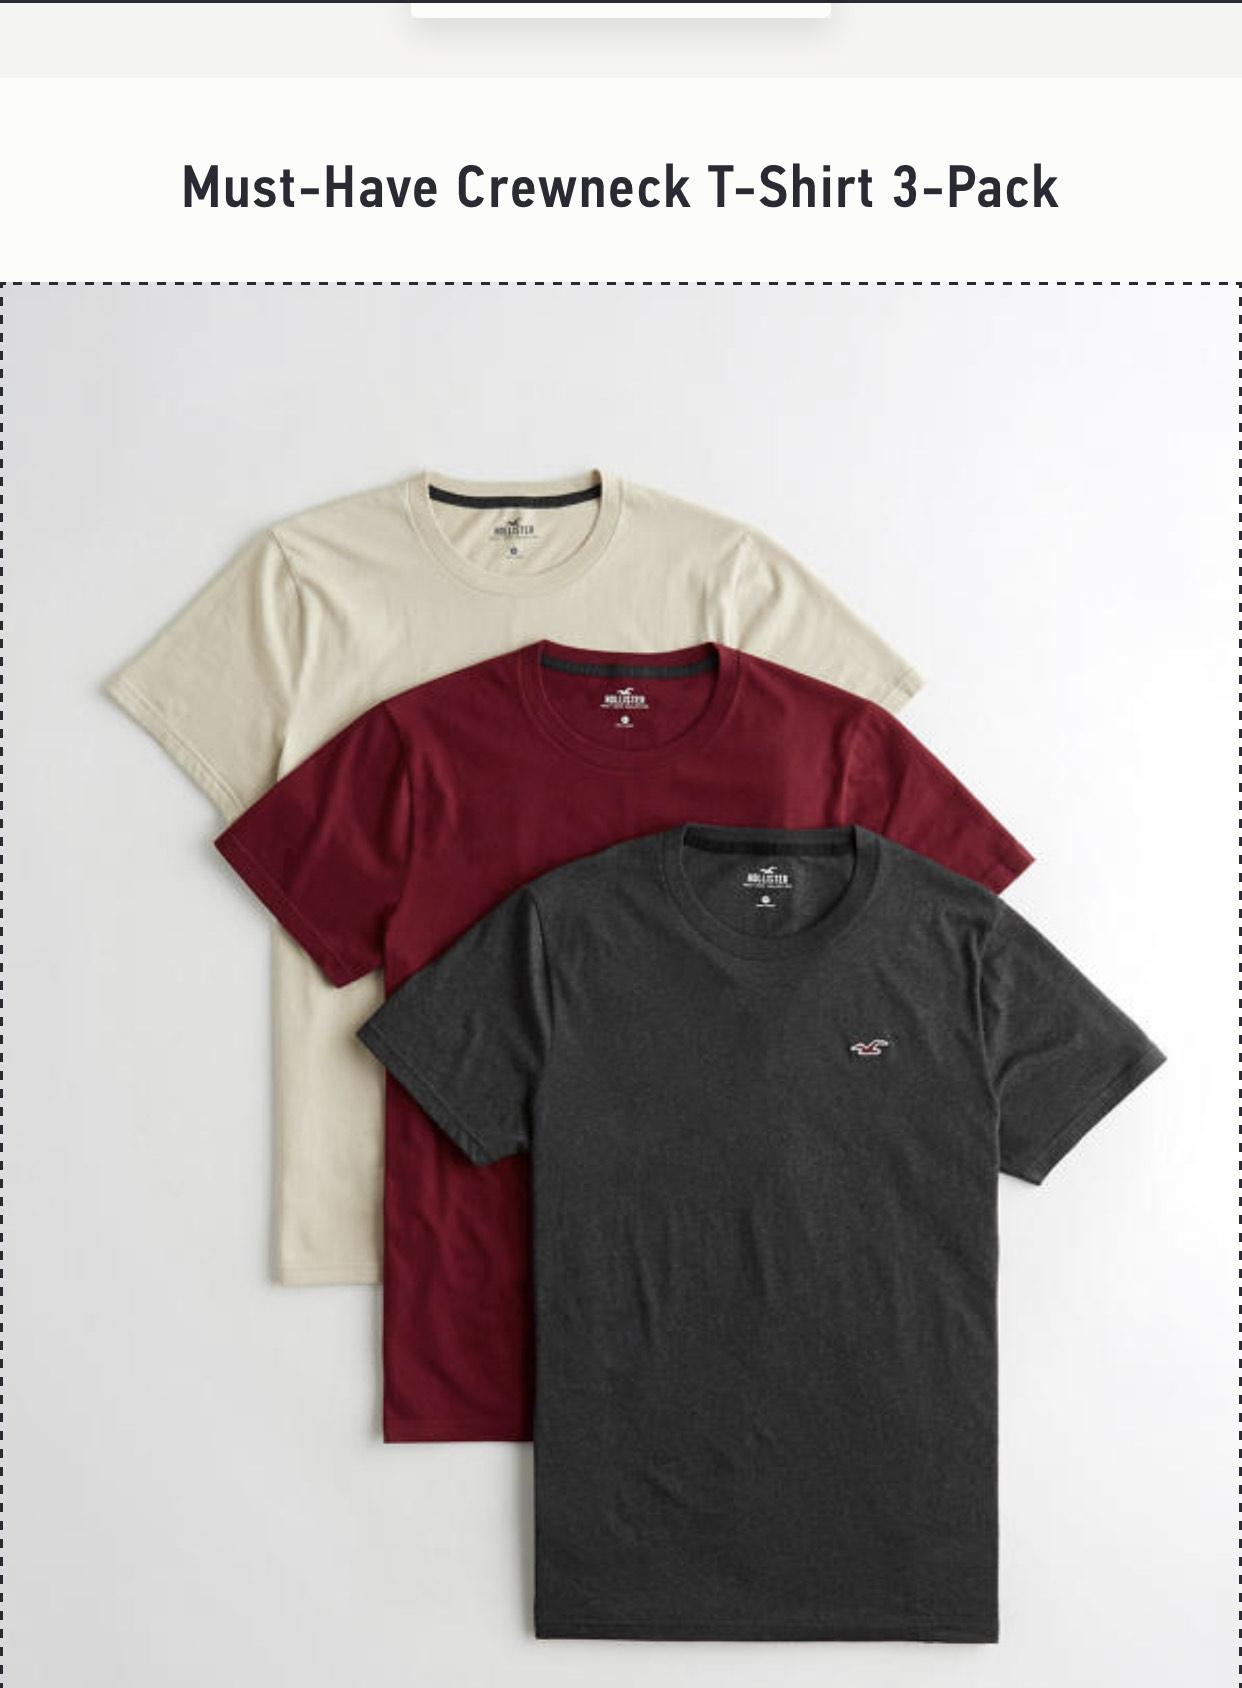 Must-Have Crewneck T-Shirt 3-Pack £14.99 at Hollister c&c